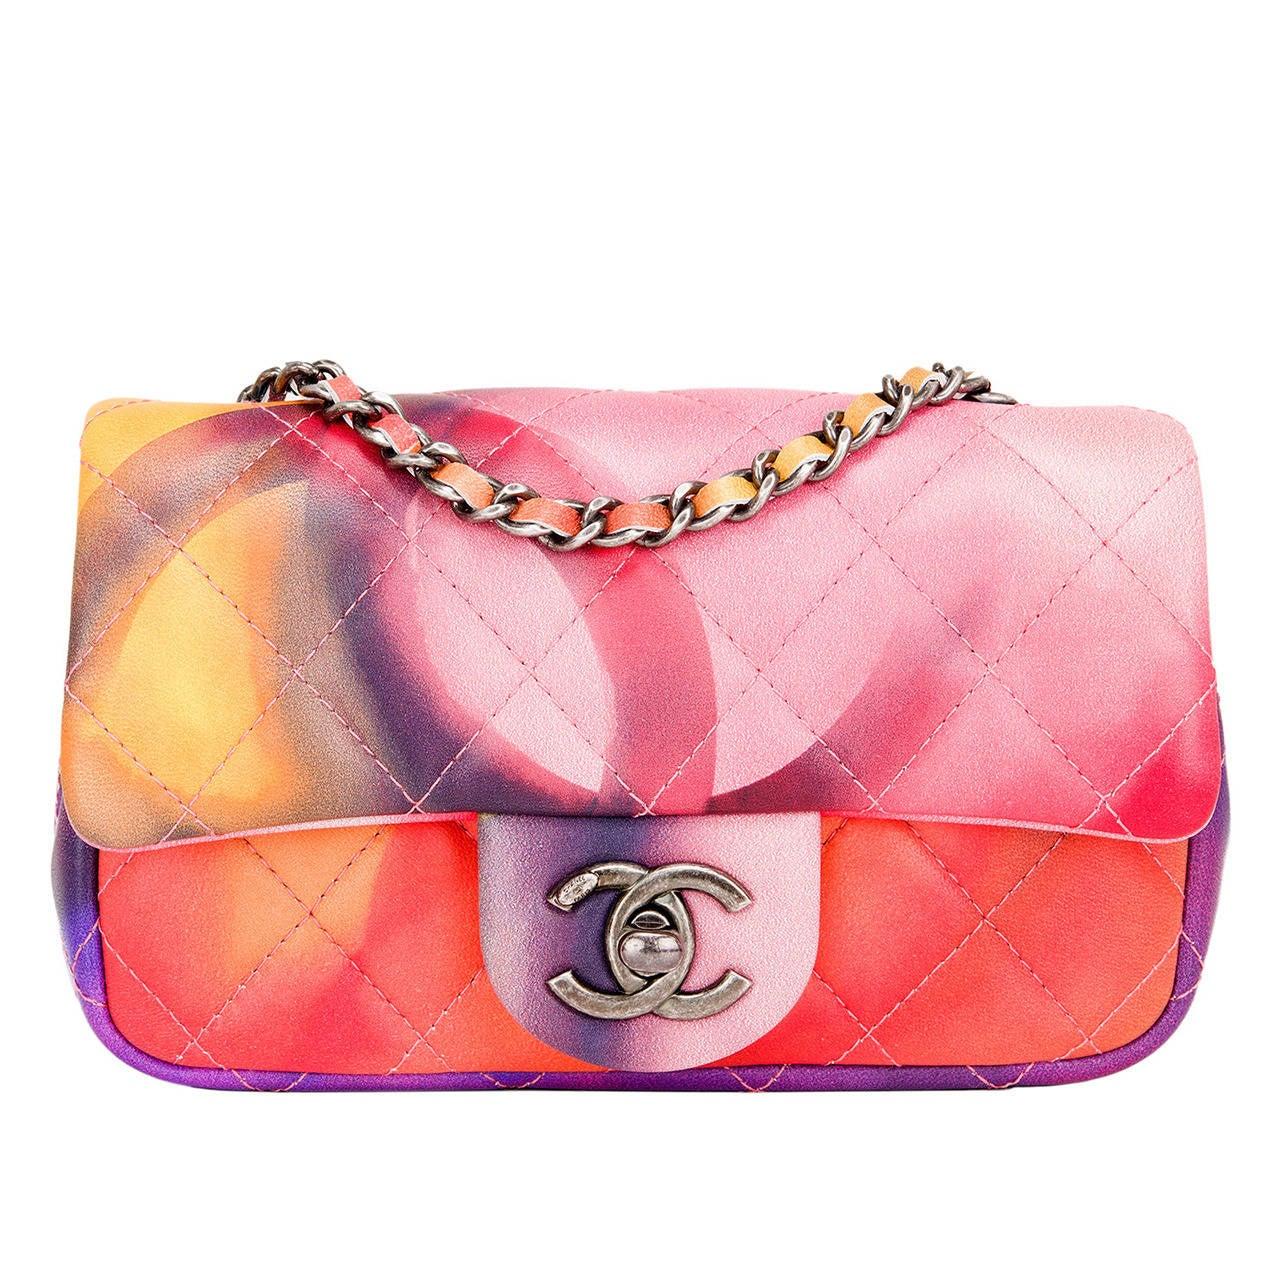 Chanel Flower Power Mini Flap Bag For Sale